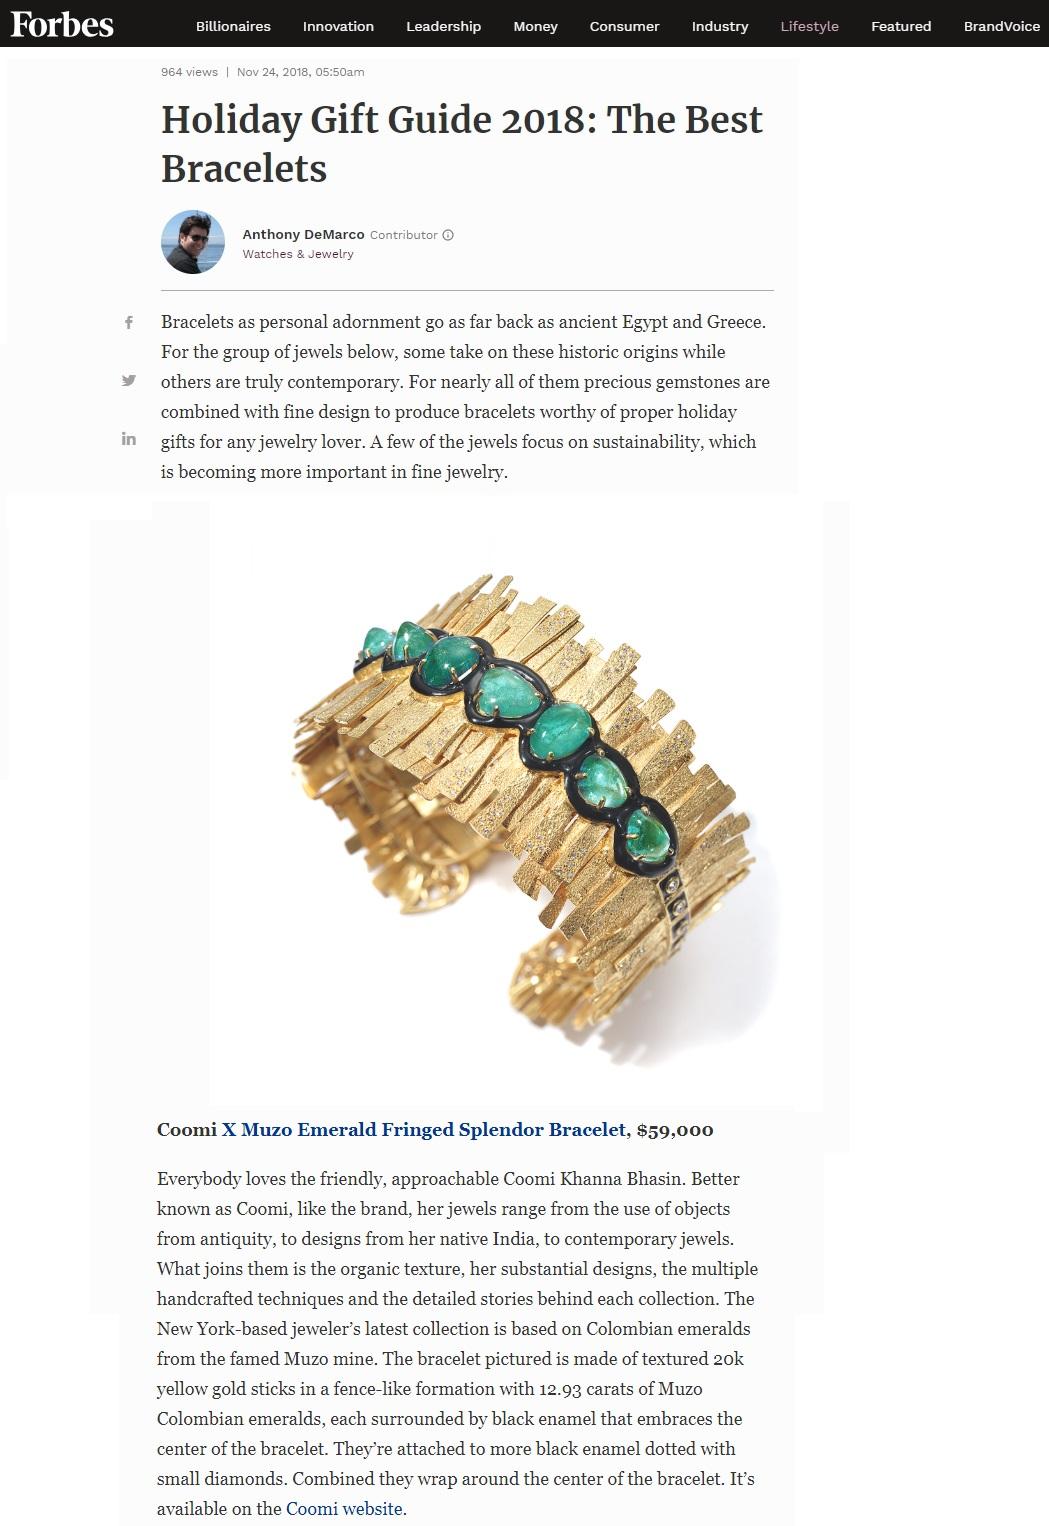 Forbes.com_COOMI_11.24.18.jpg